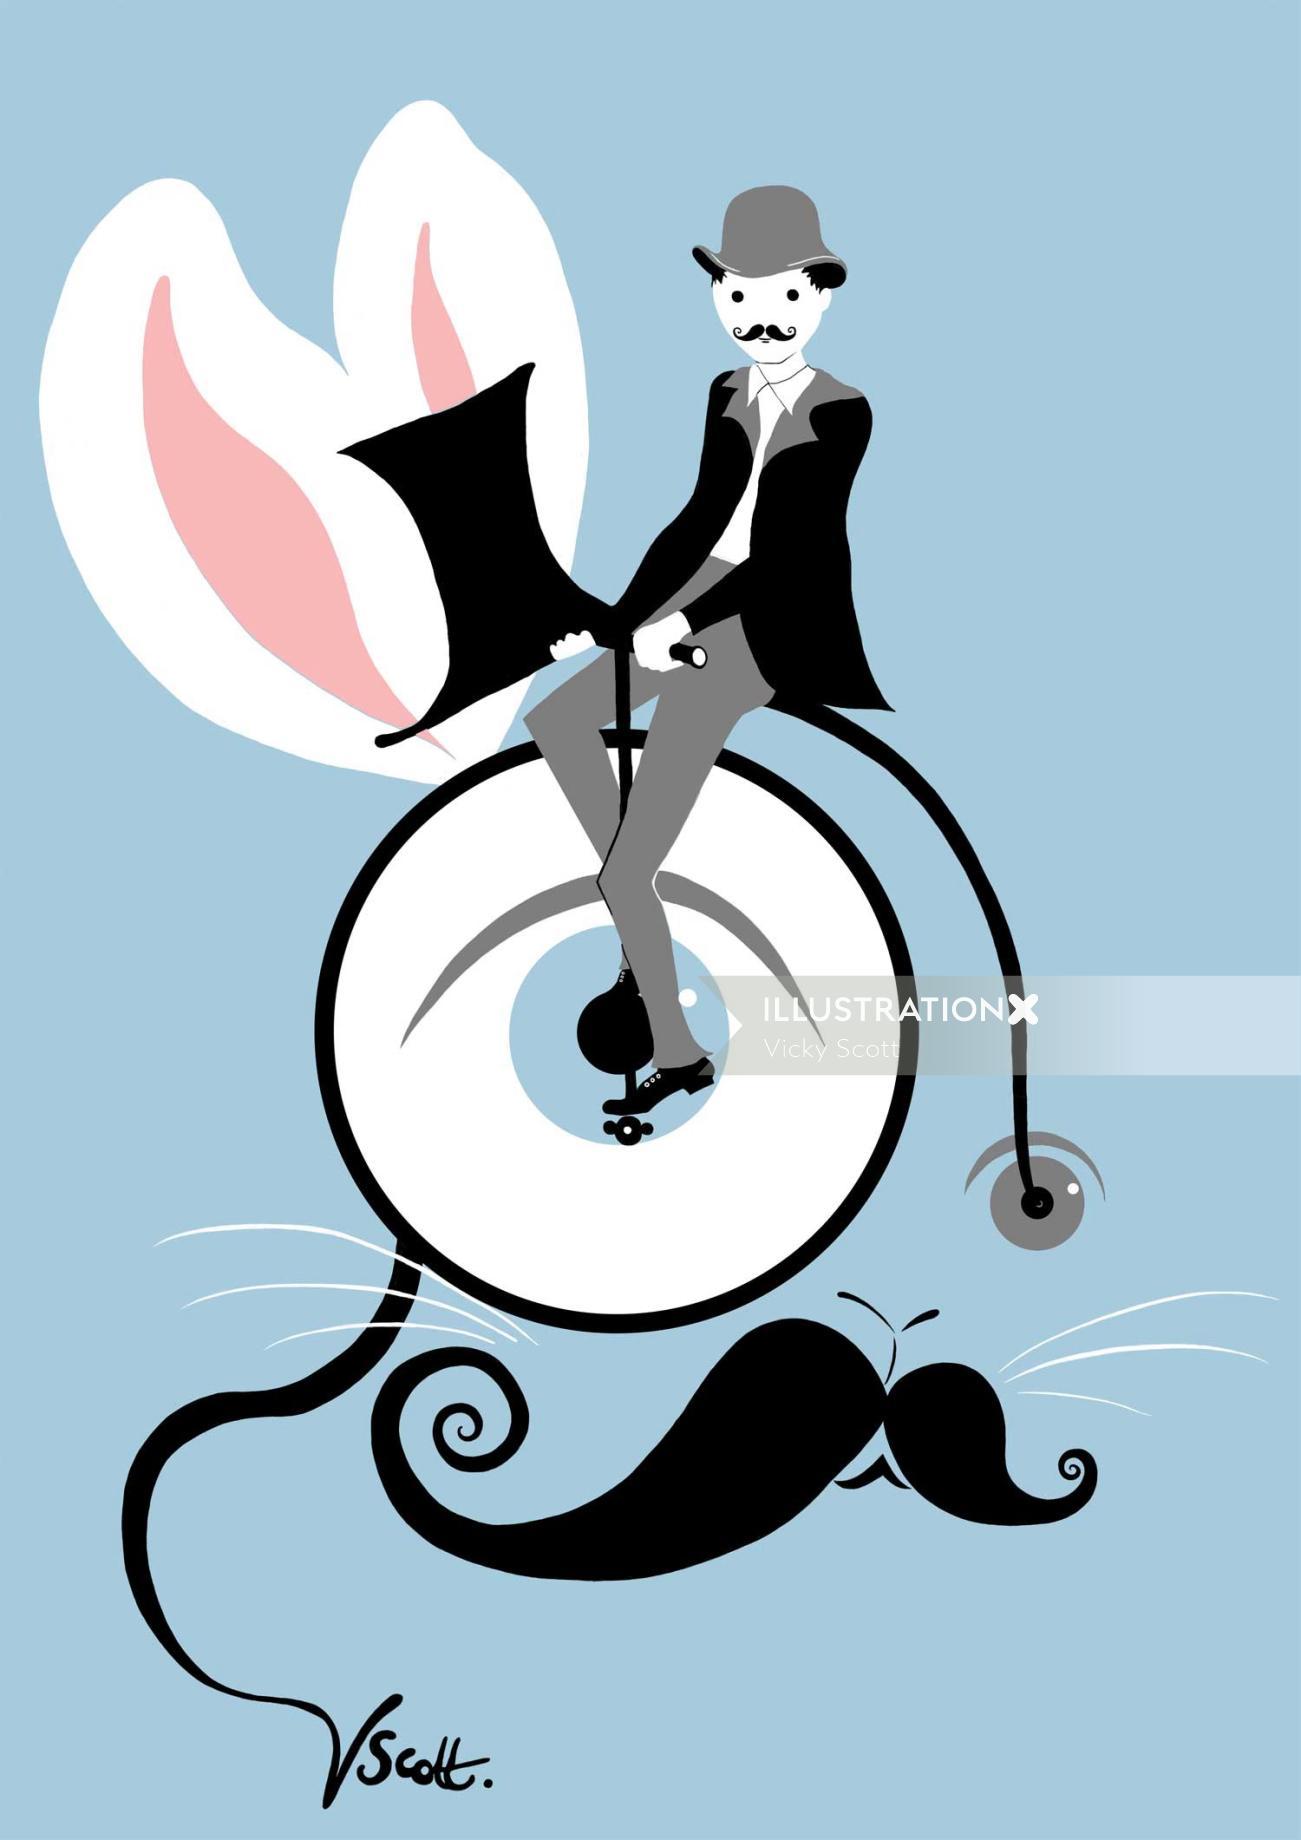 rabbit, bike, bicycle, victorian, man, gentleman, monocle